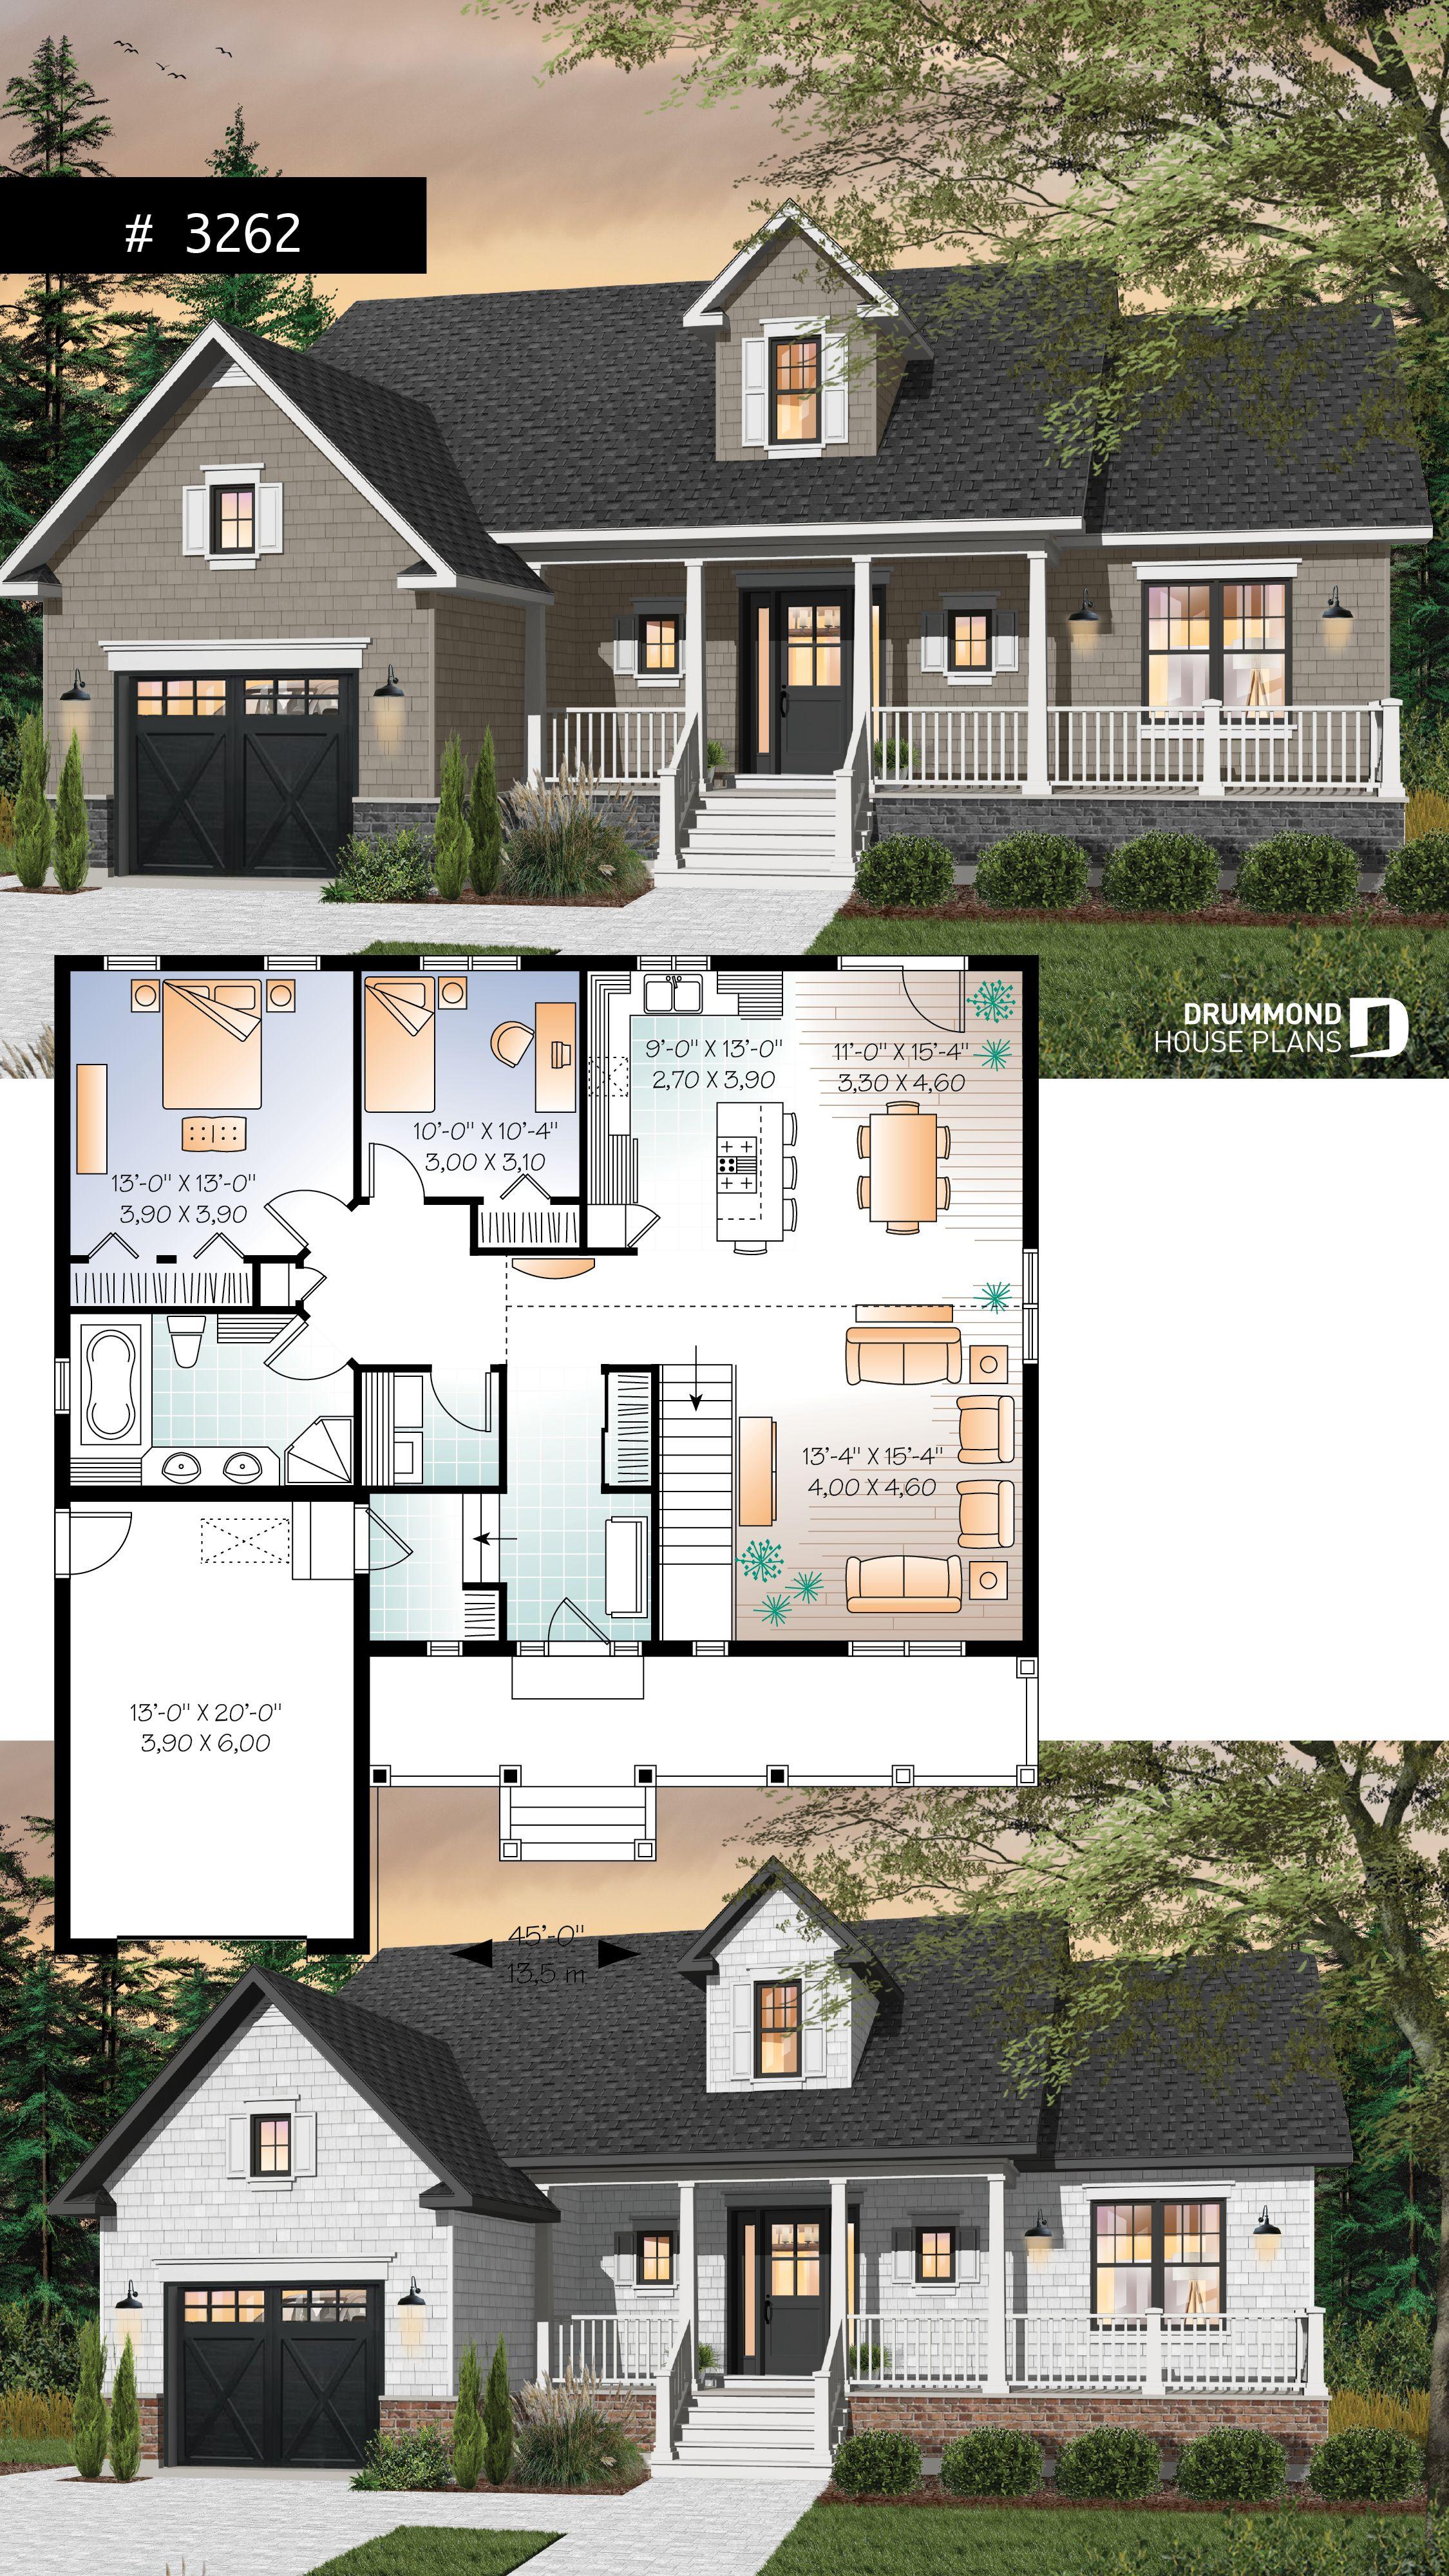 House Plan Brewster No 3262 Bungalow House Plans Craftsman